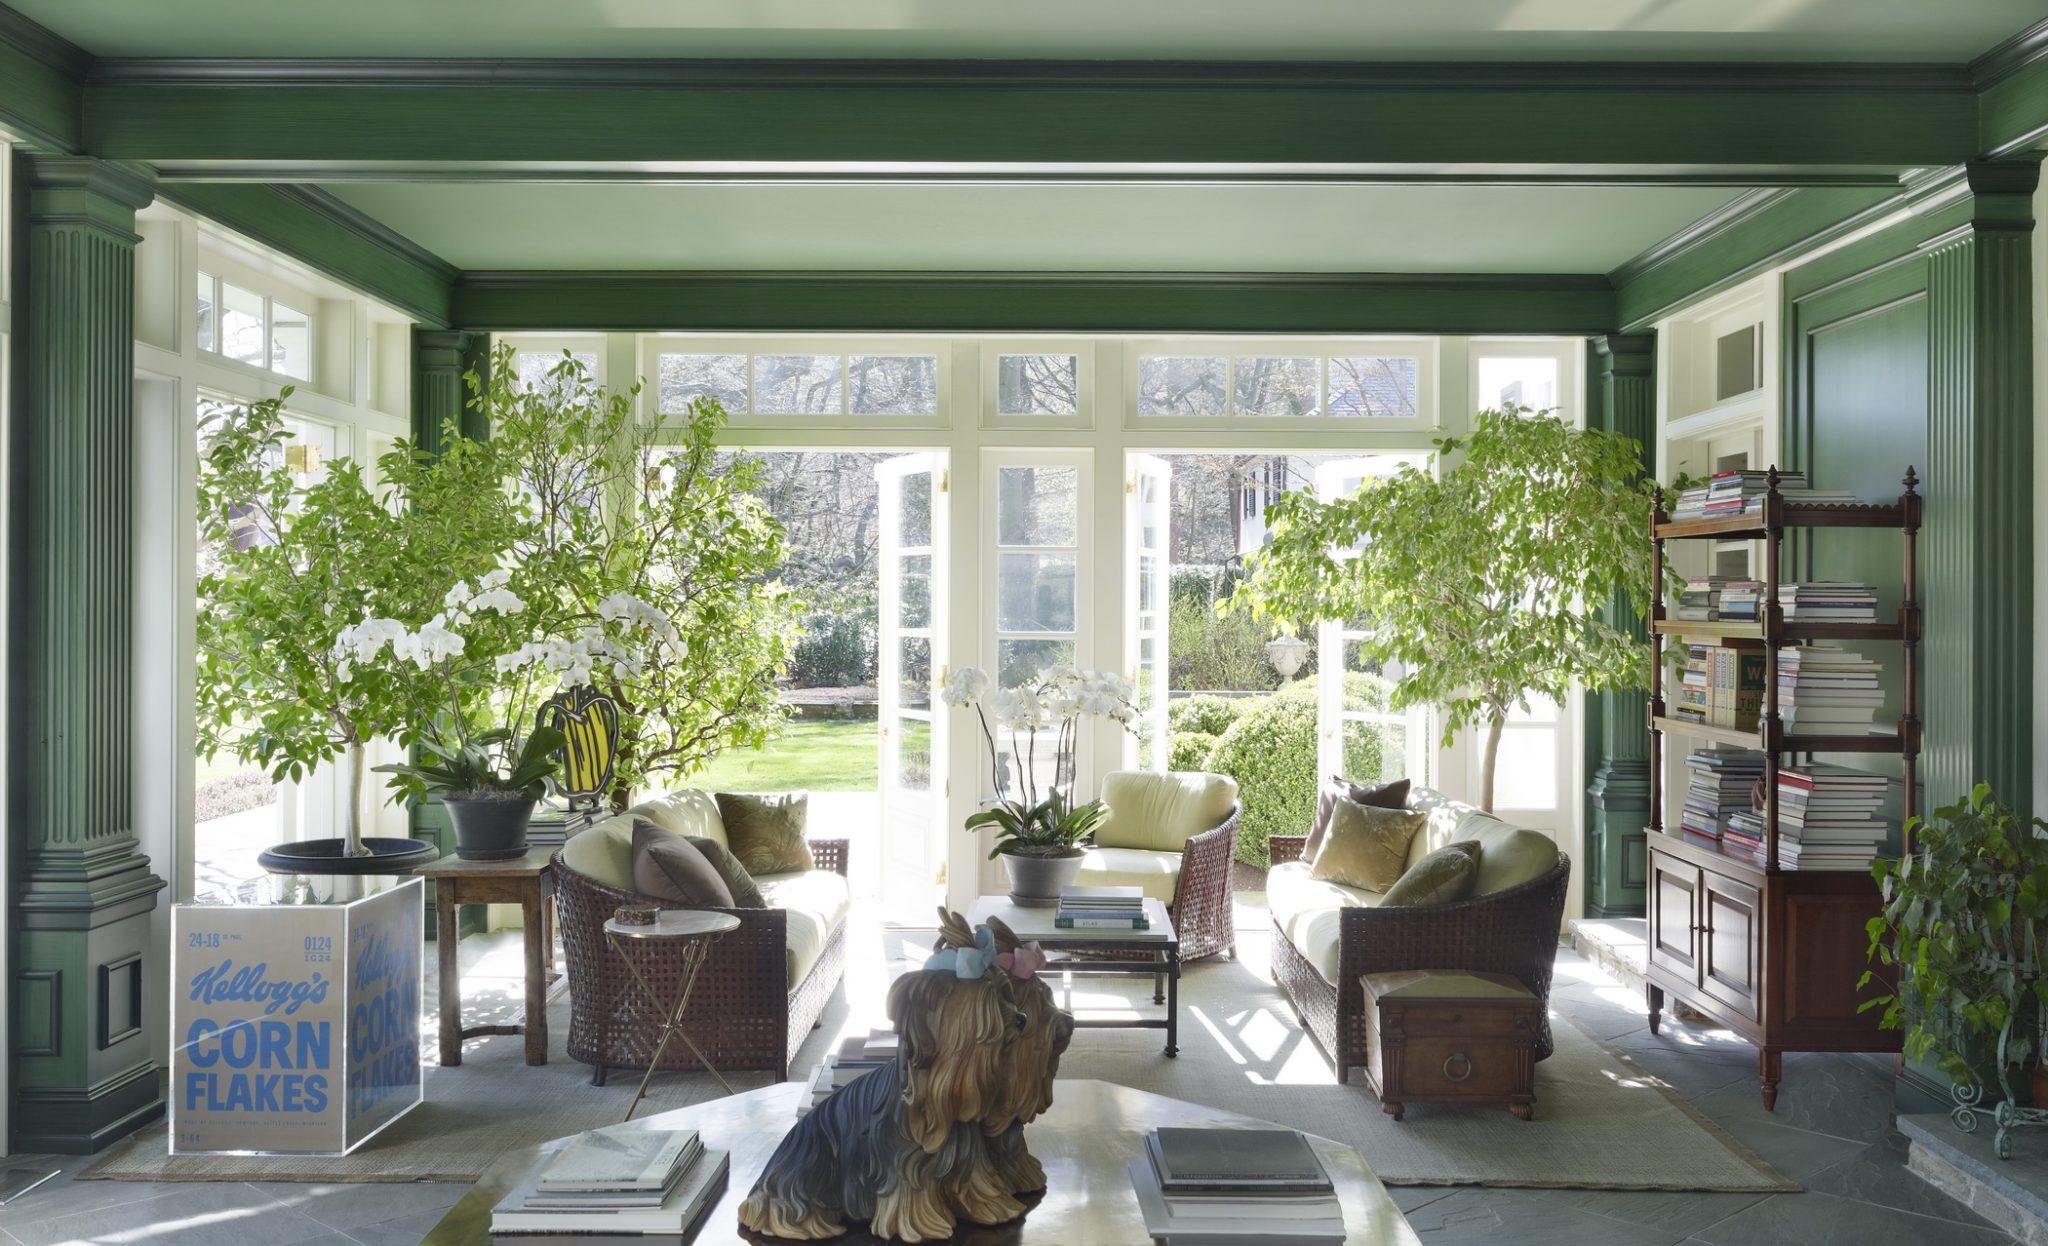 Interior design by Jayne Design Studio, Inc.